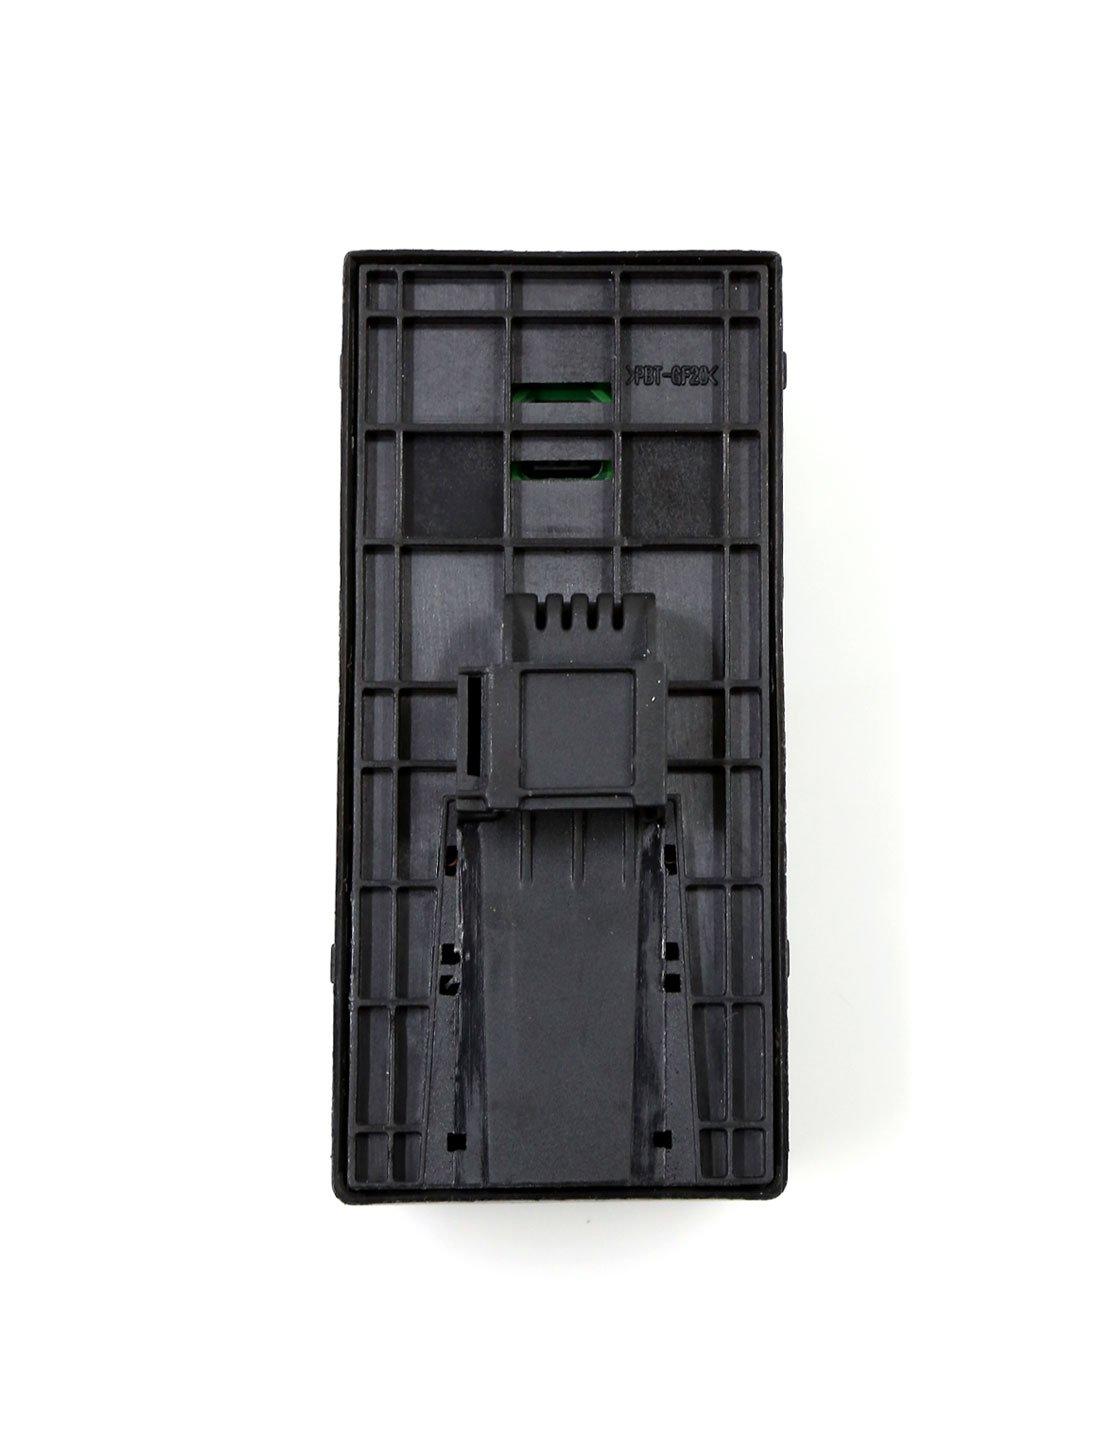 Sourcingmap 8Ed 959 851B A4 B6 B7 Interruptor Consola de Elevalunas Botonera